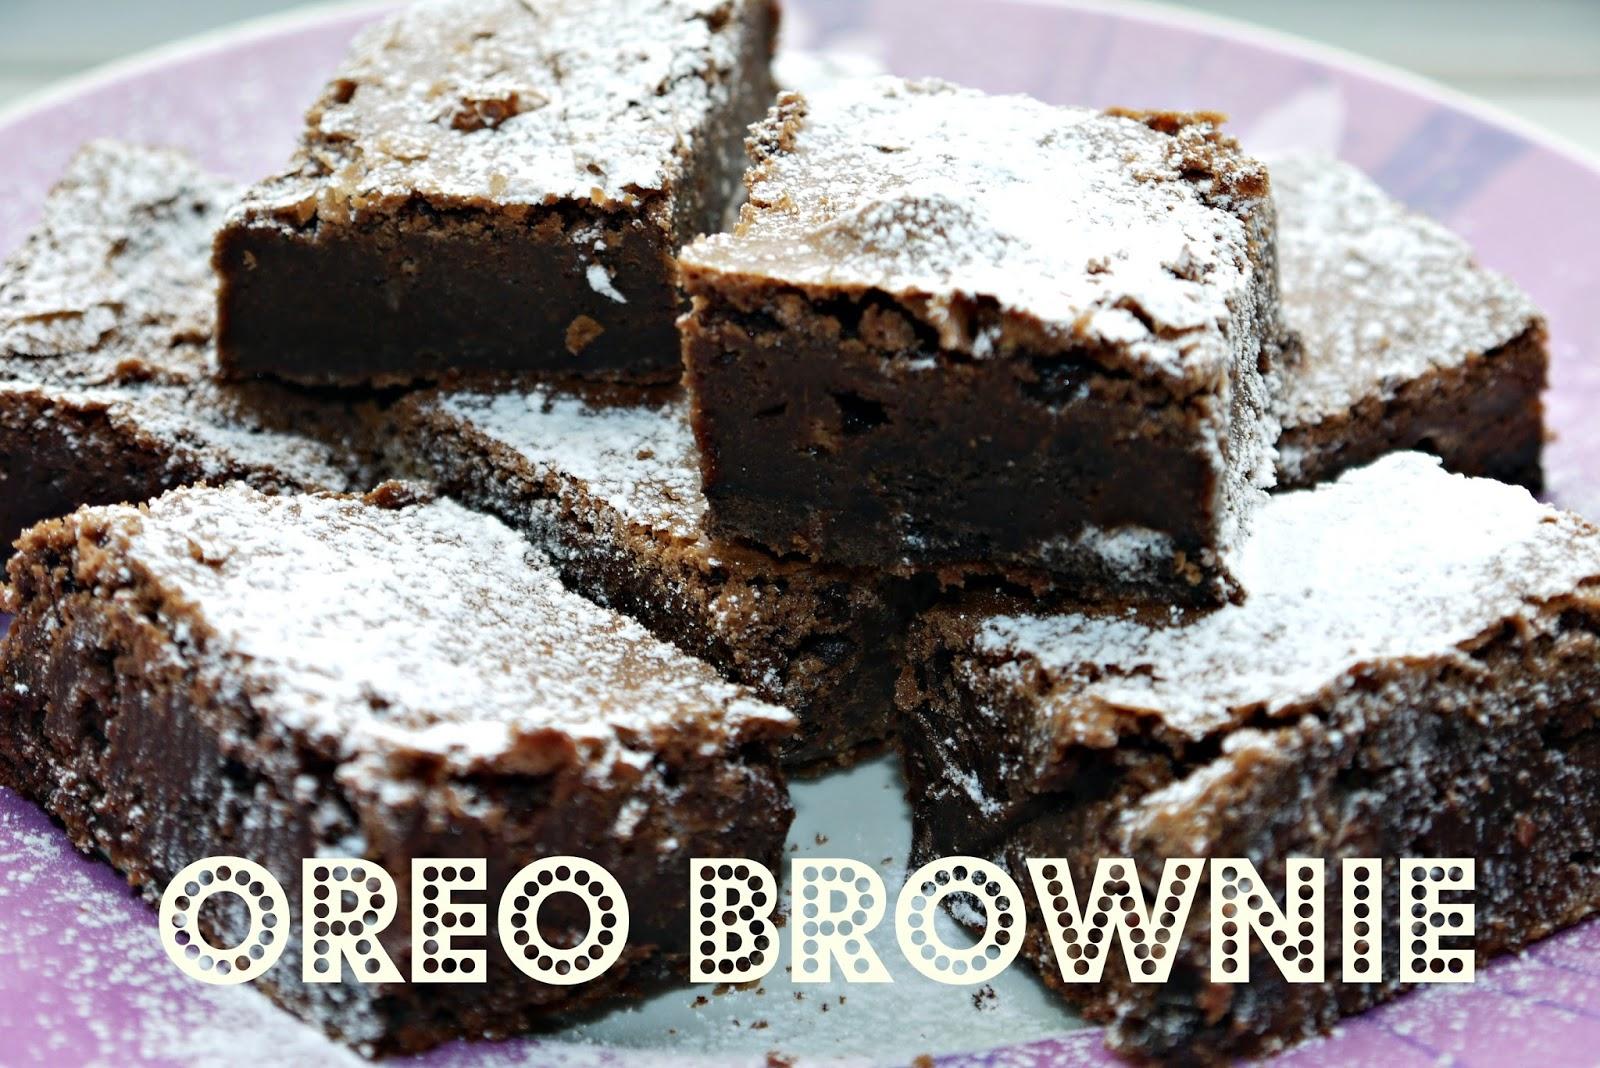 Inside the Wendy House: Oreo Brownie Traybake Recipe